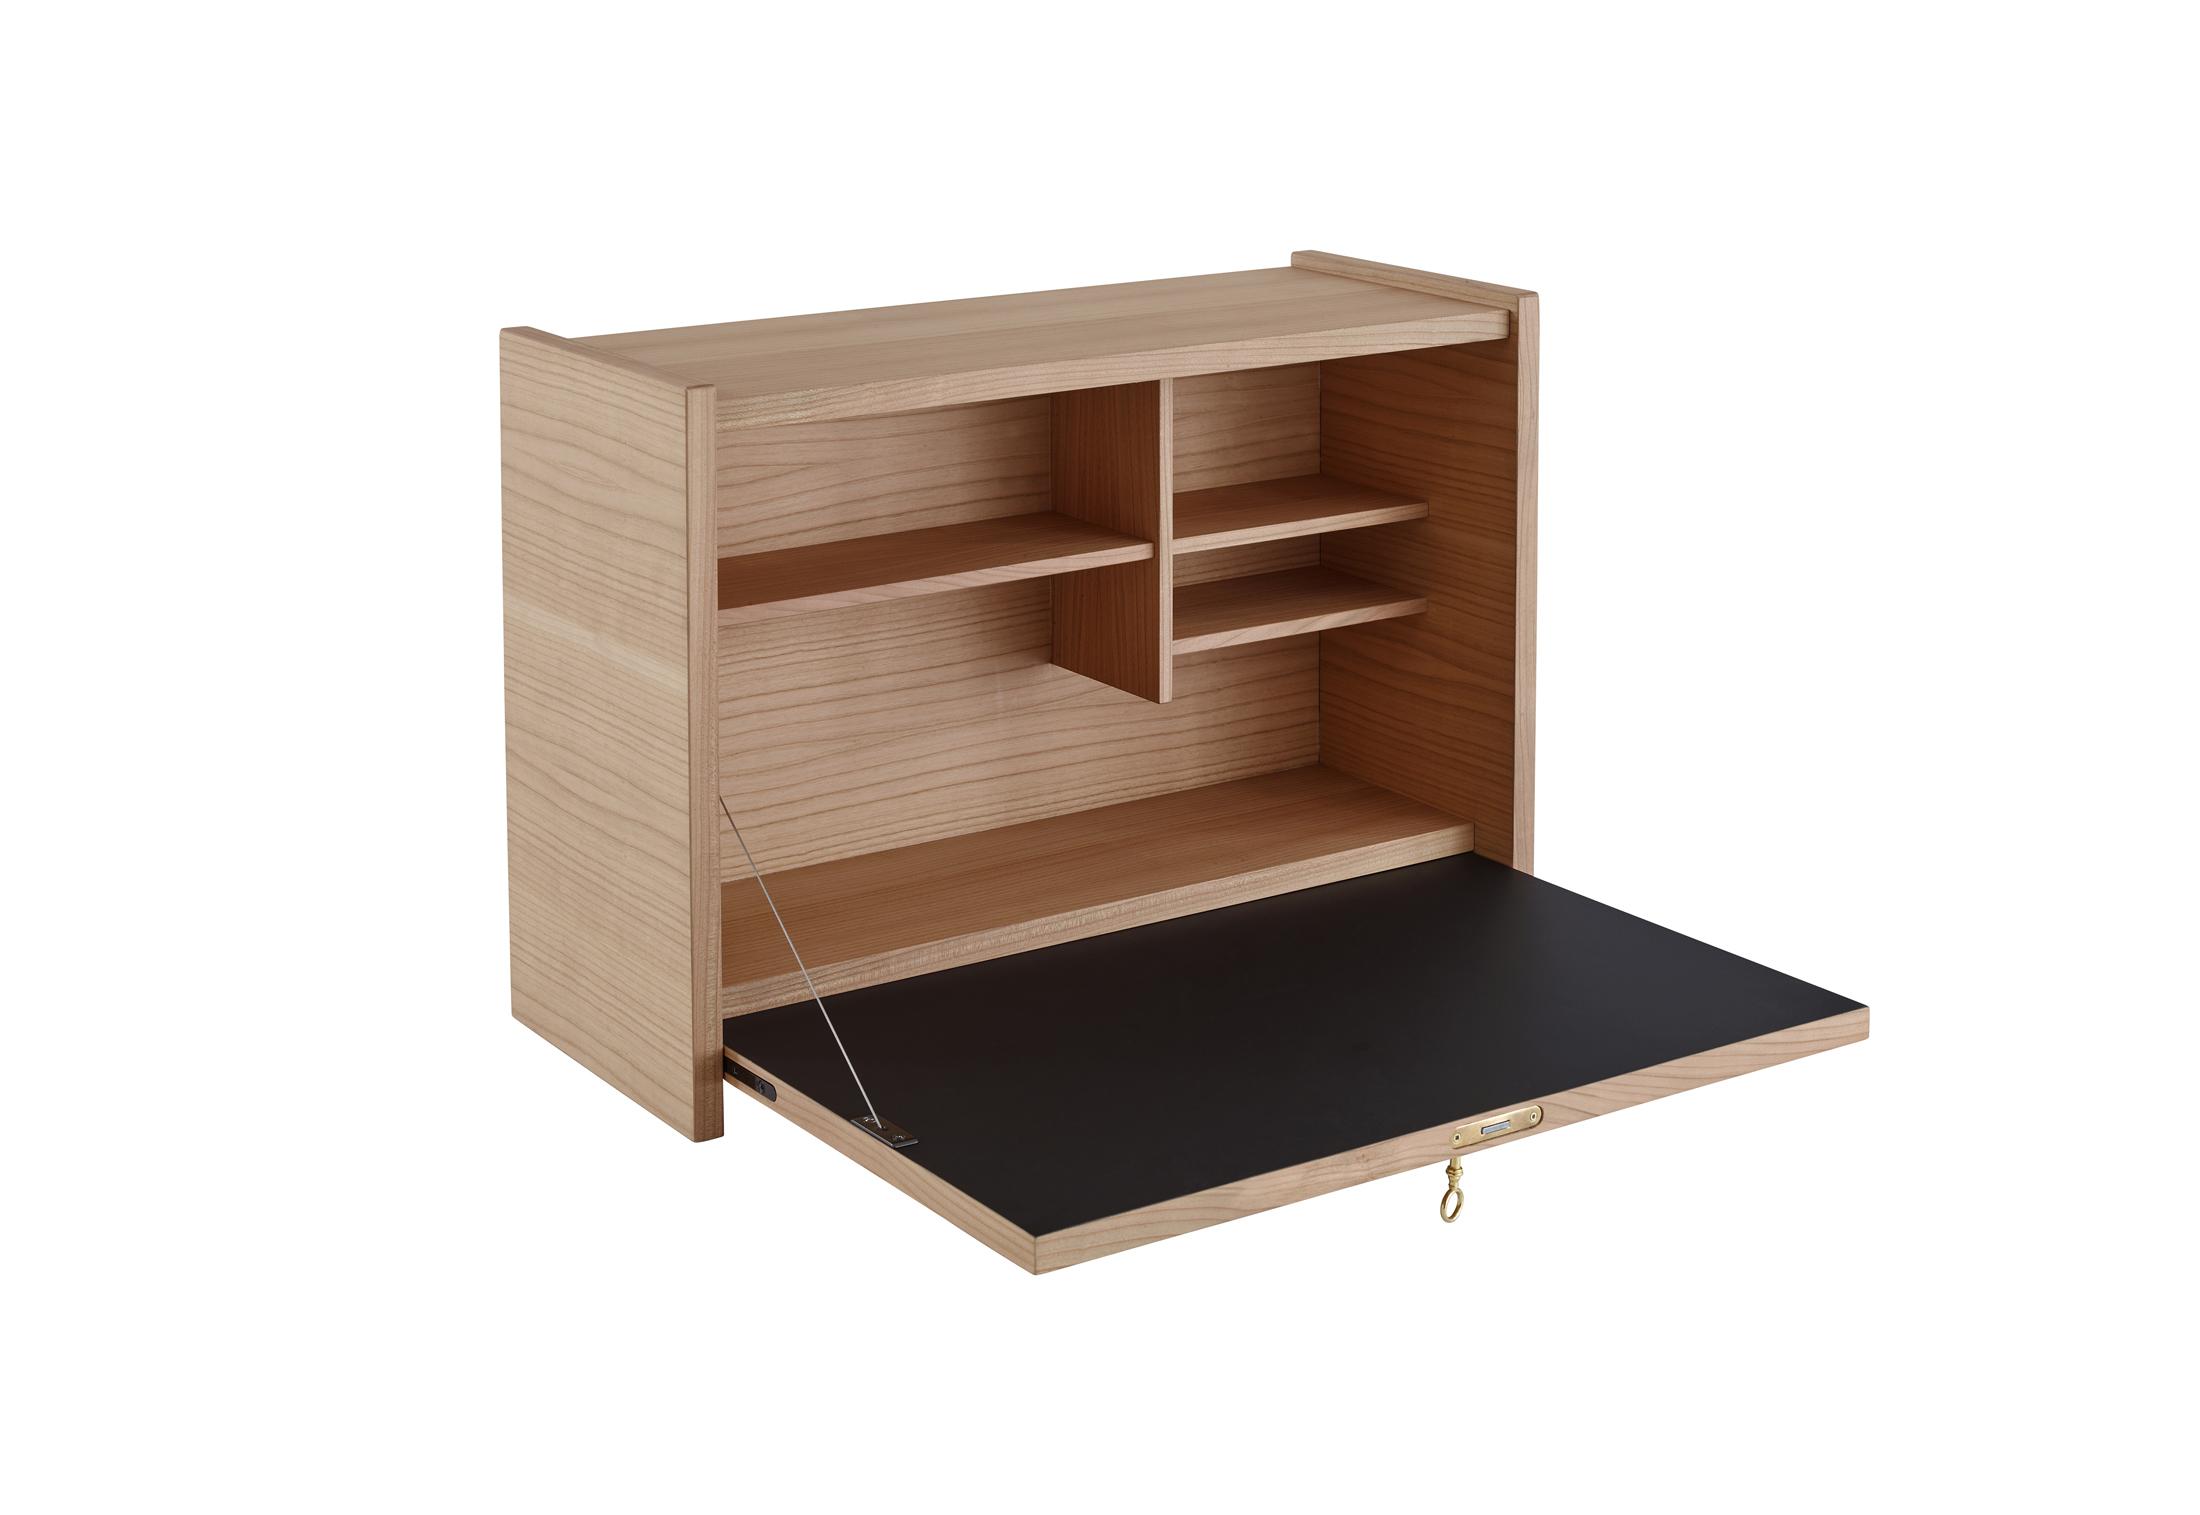 le secr taire mural by ligne roset stylepark. Black Bedroom Furniture Sets. Home Design Ideas